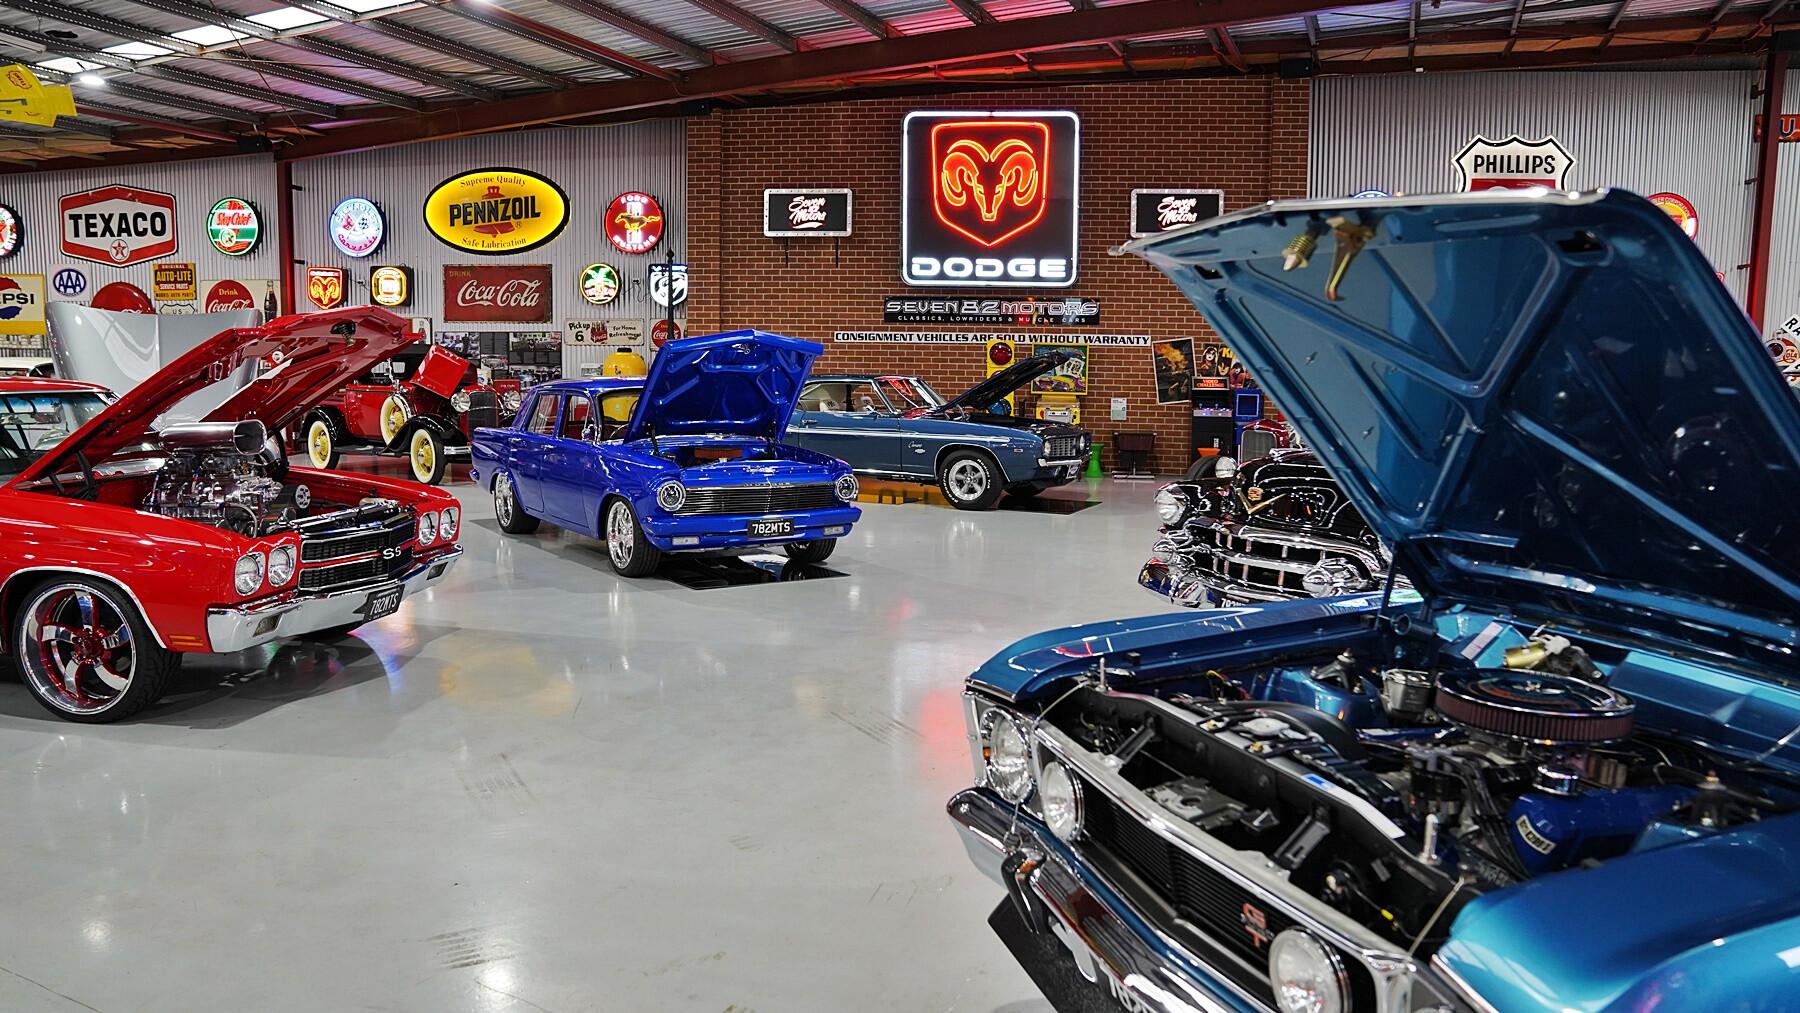 Street Machine News Seven 82 Motor Auction 3